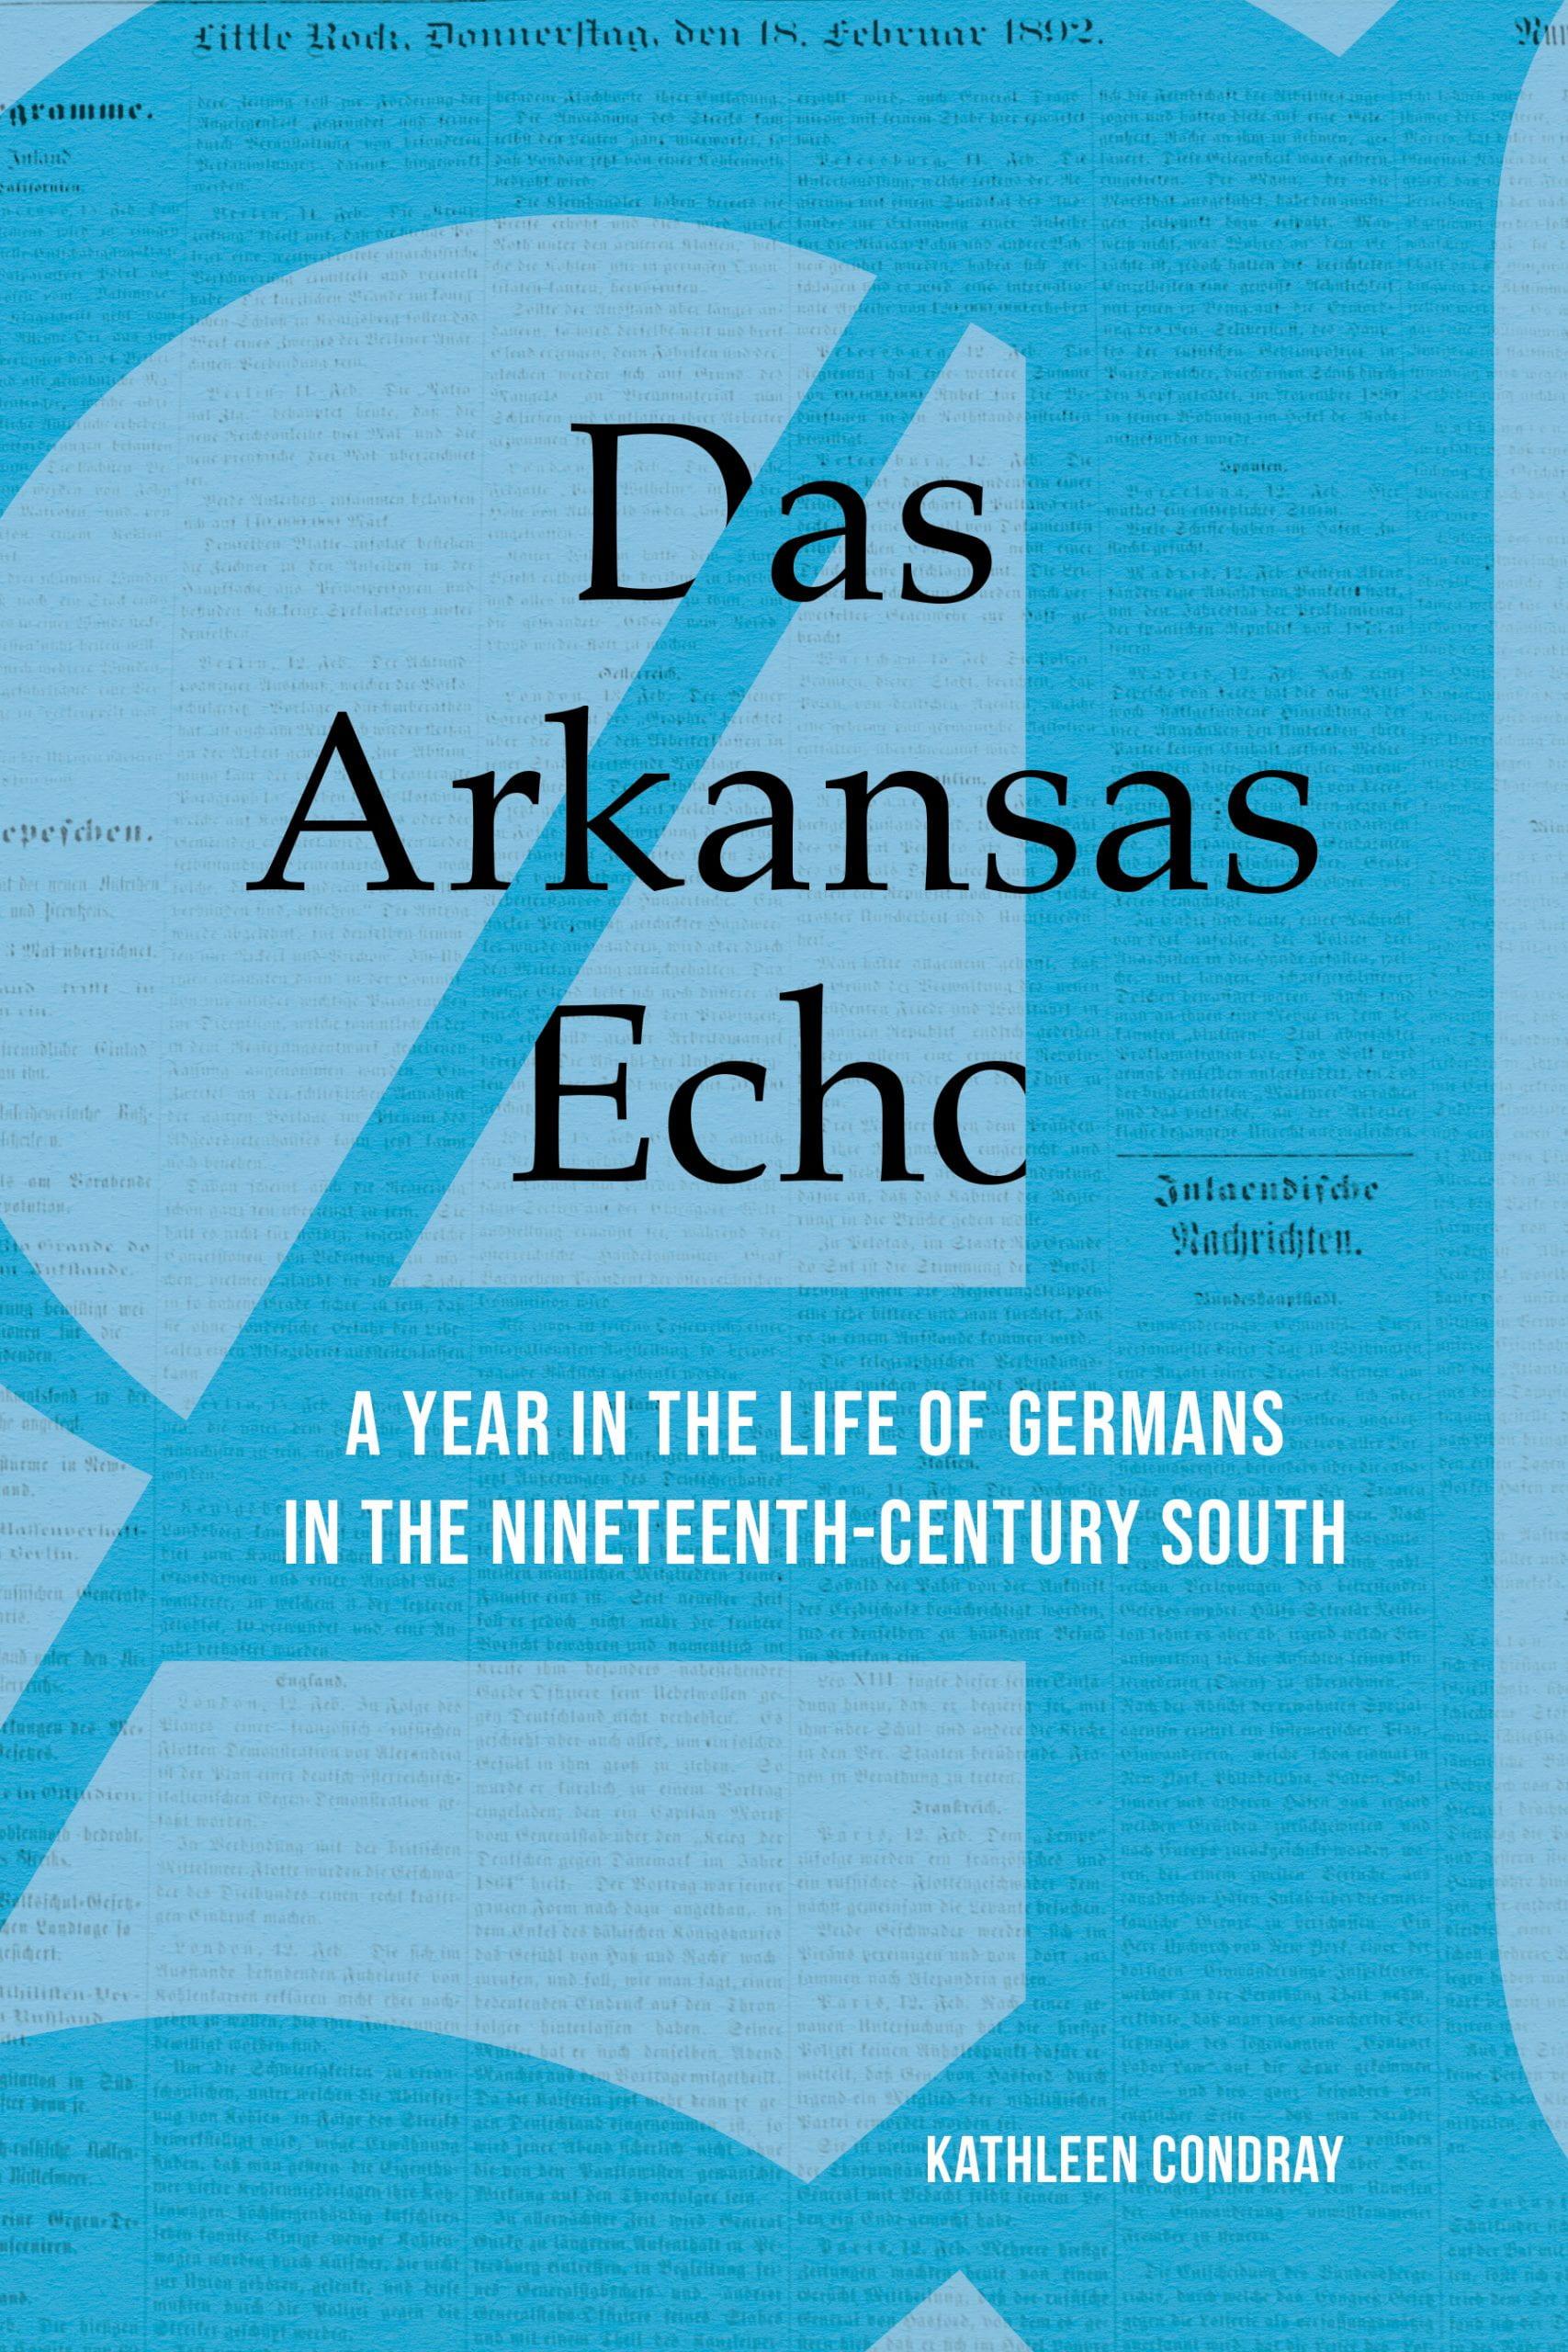 cover image for Das Arkansas Echo by Kathleen Condray